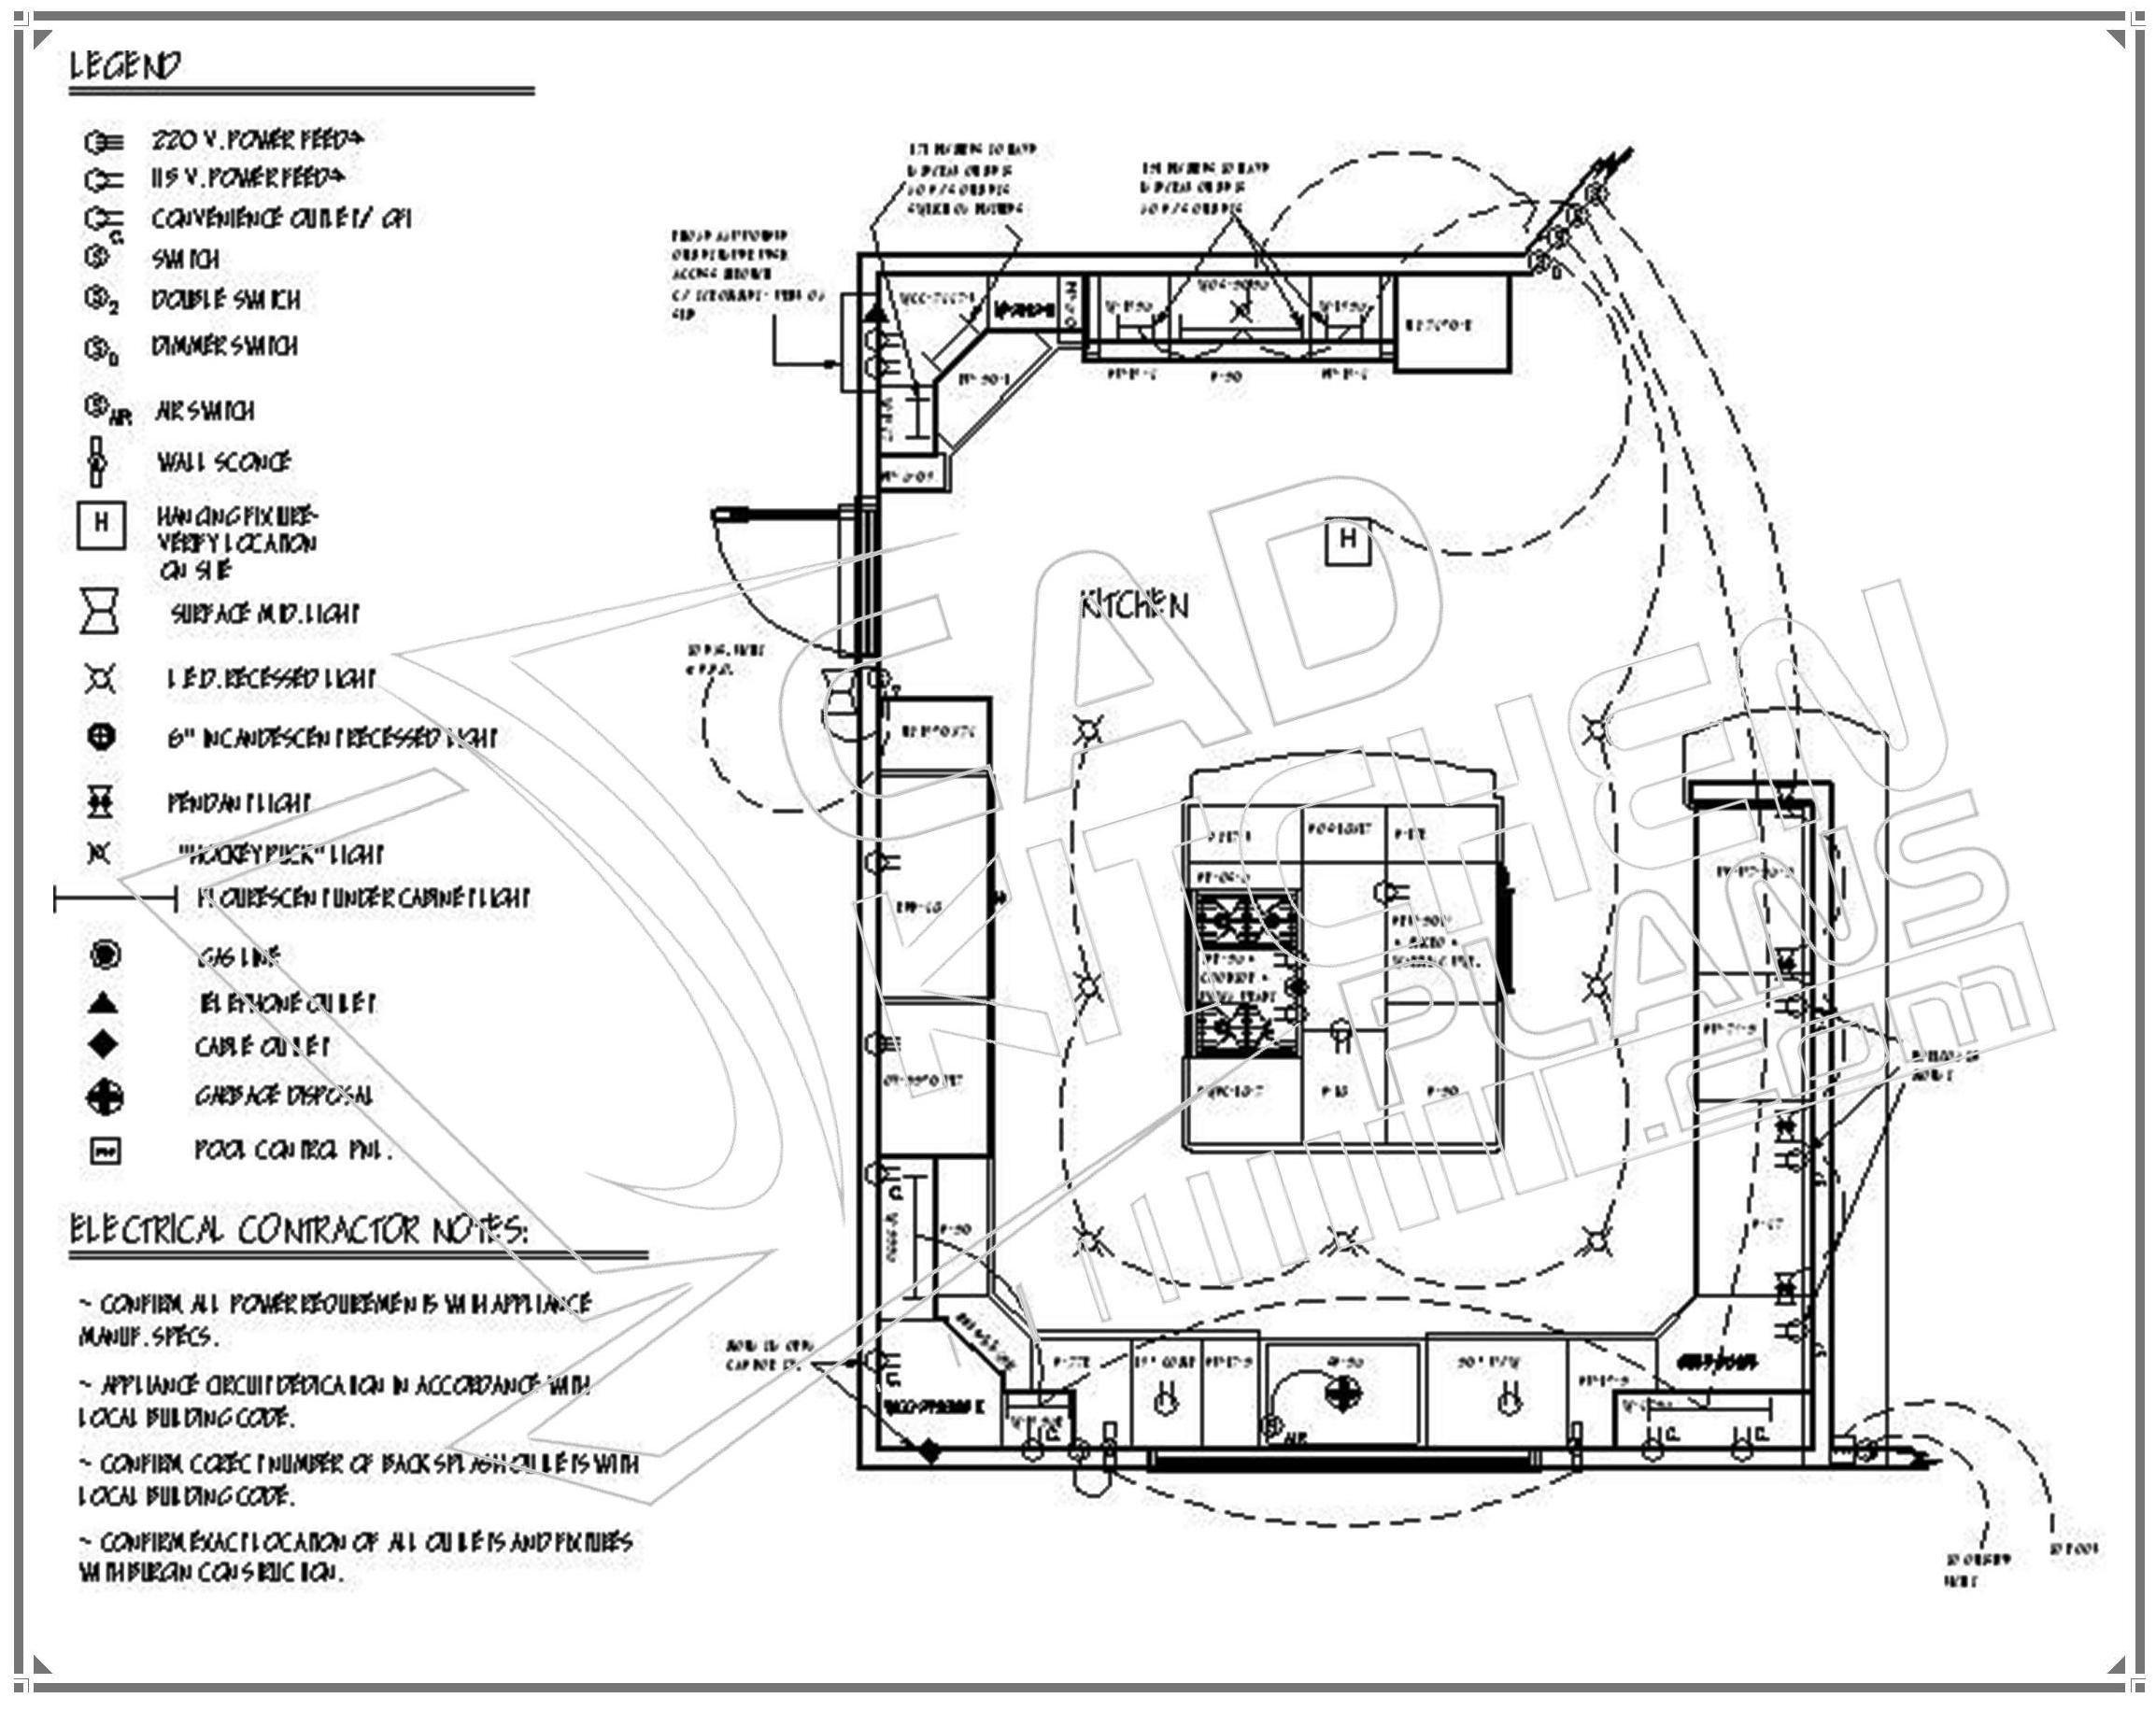 Diagram Wiringdiagram Diagramming Diagramm Visuals Visualisation Graphical Kitchen Floor Plans Bathroom Remodel Designs Kitchen Designs Layout